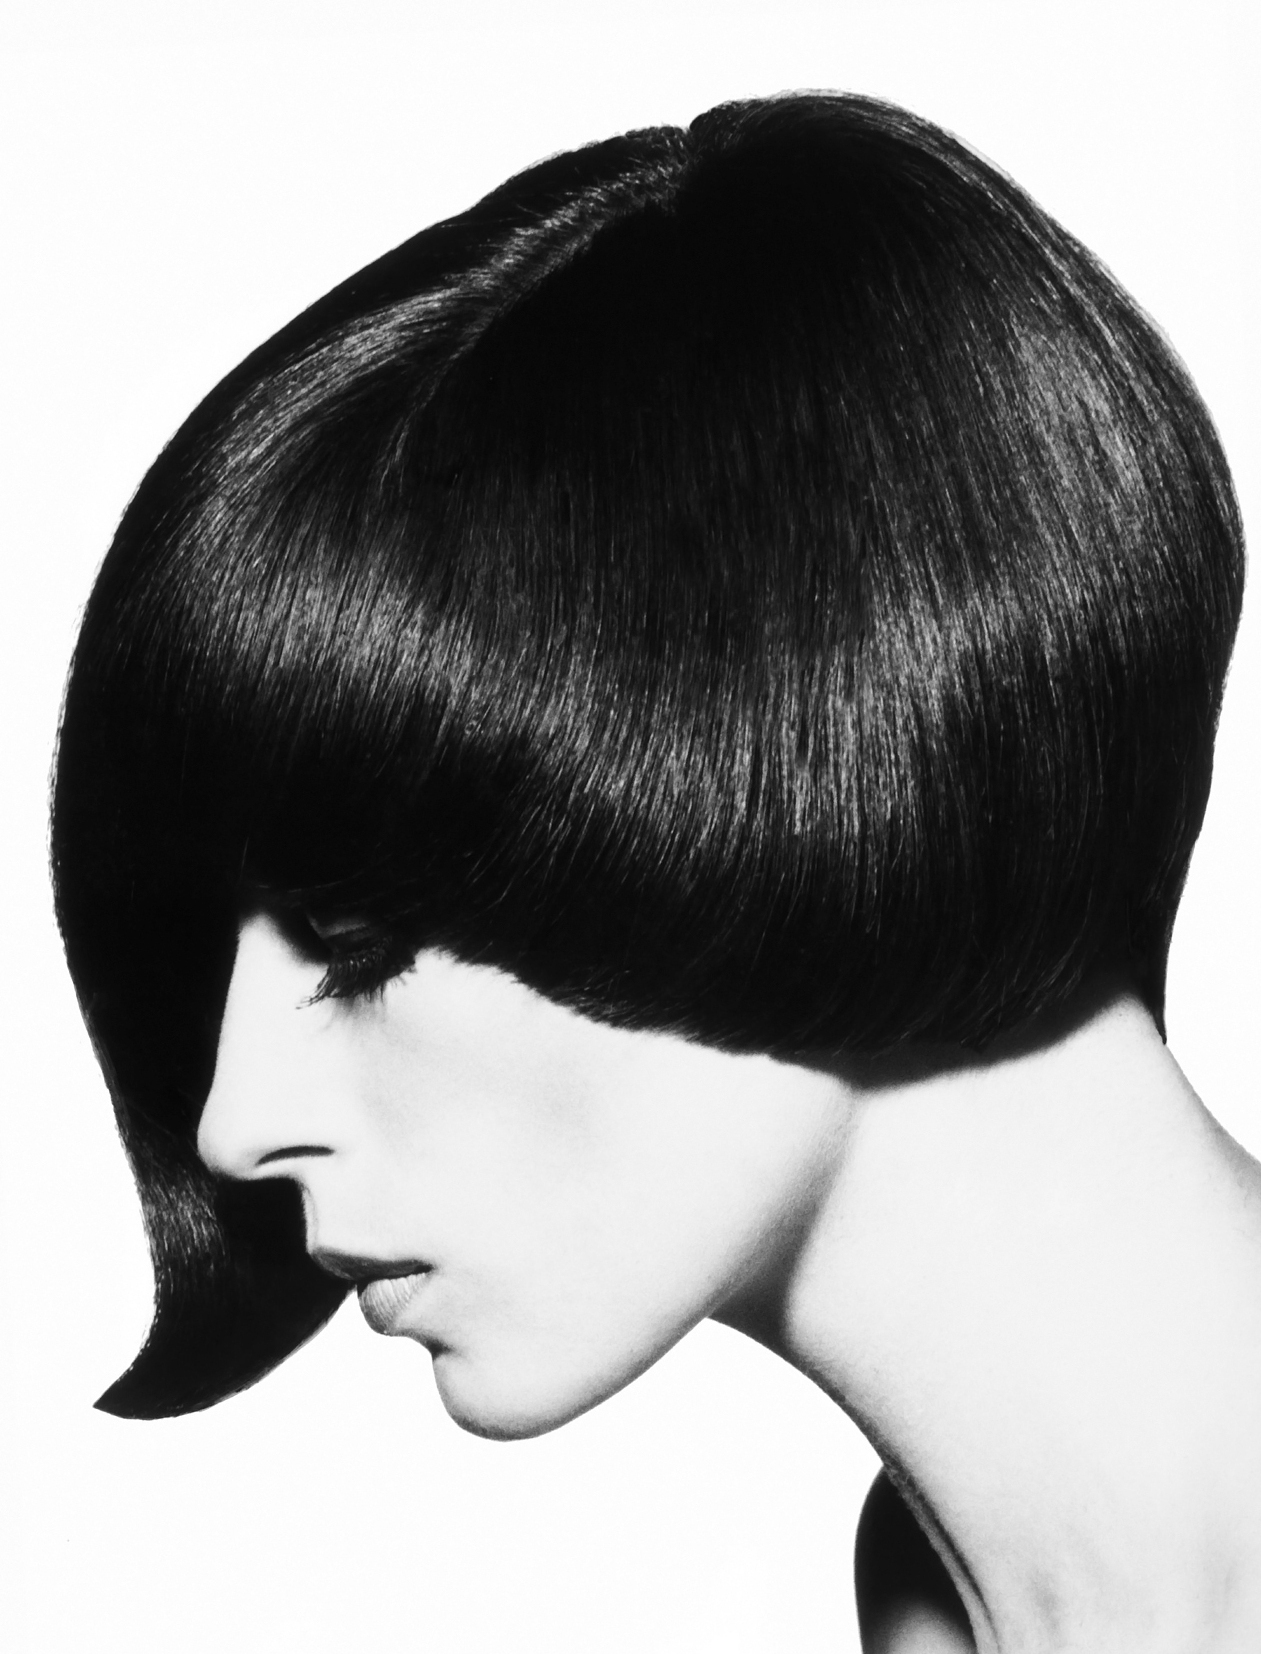 european hairstyles through the ages: 1916 - 2016